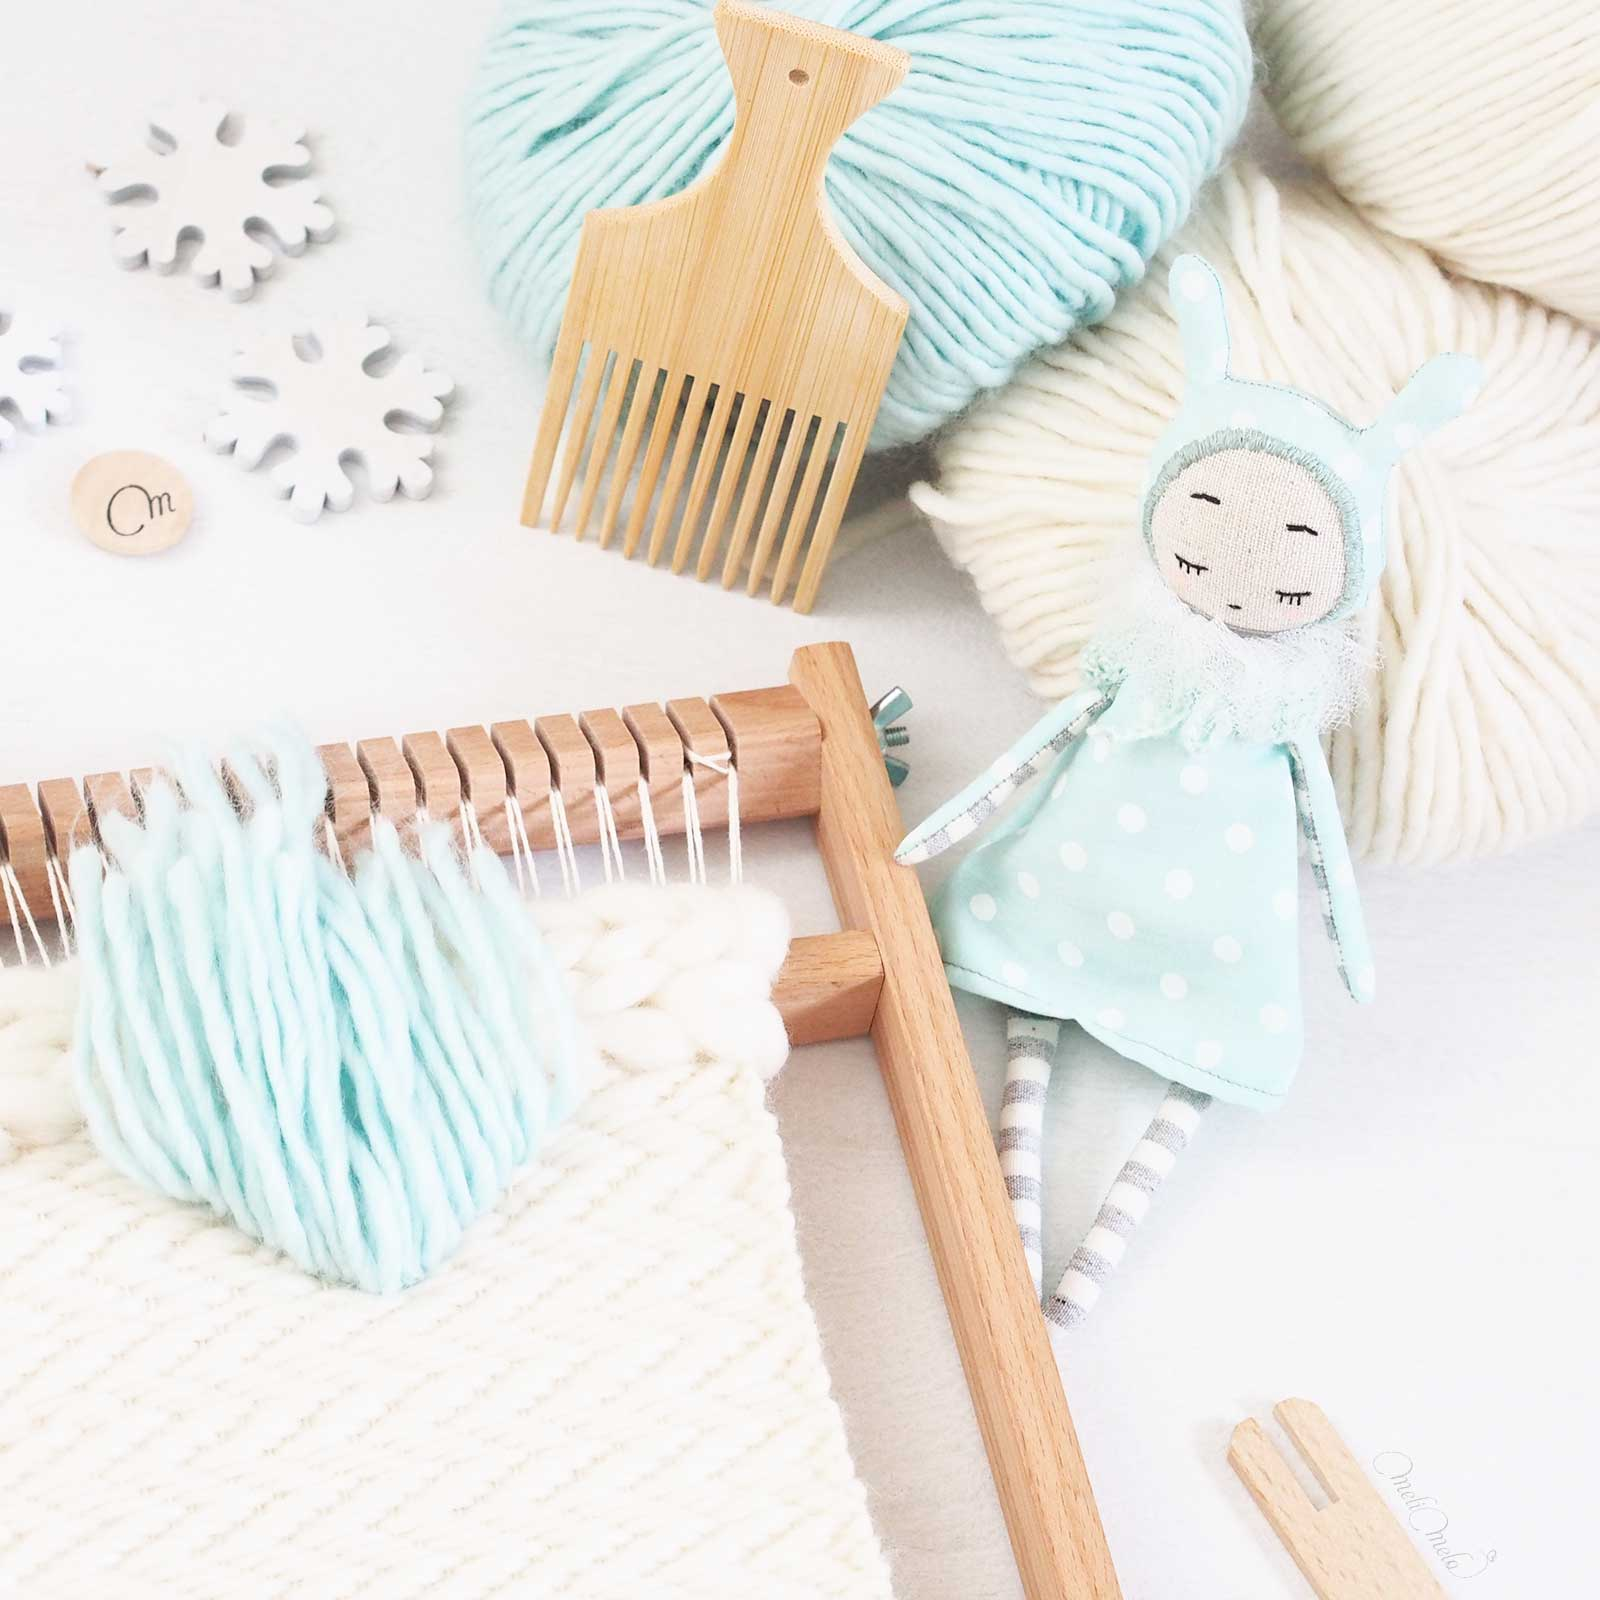 tisaje lana pluma en curso handmade muñeca nikolete laboutiquedemelimelo